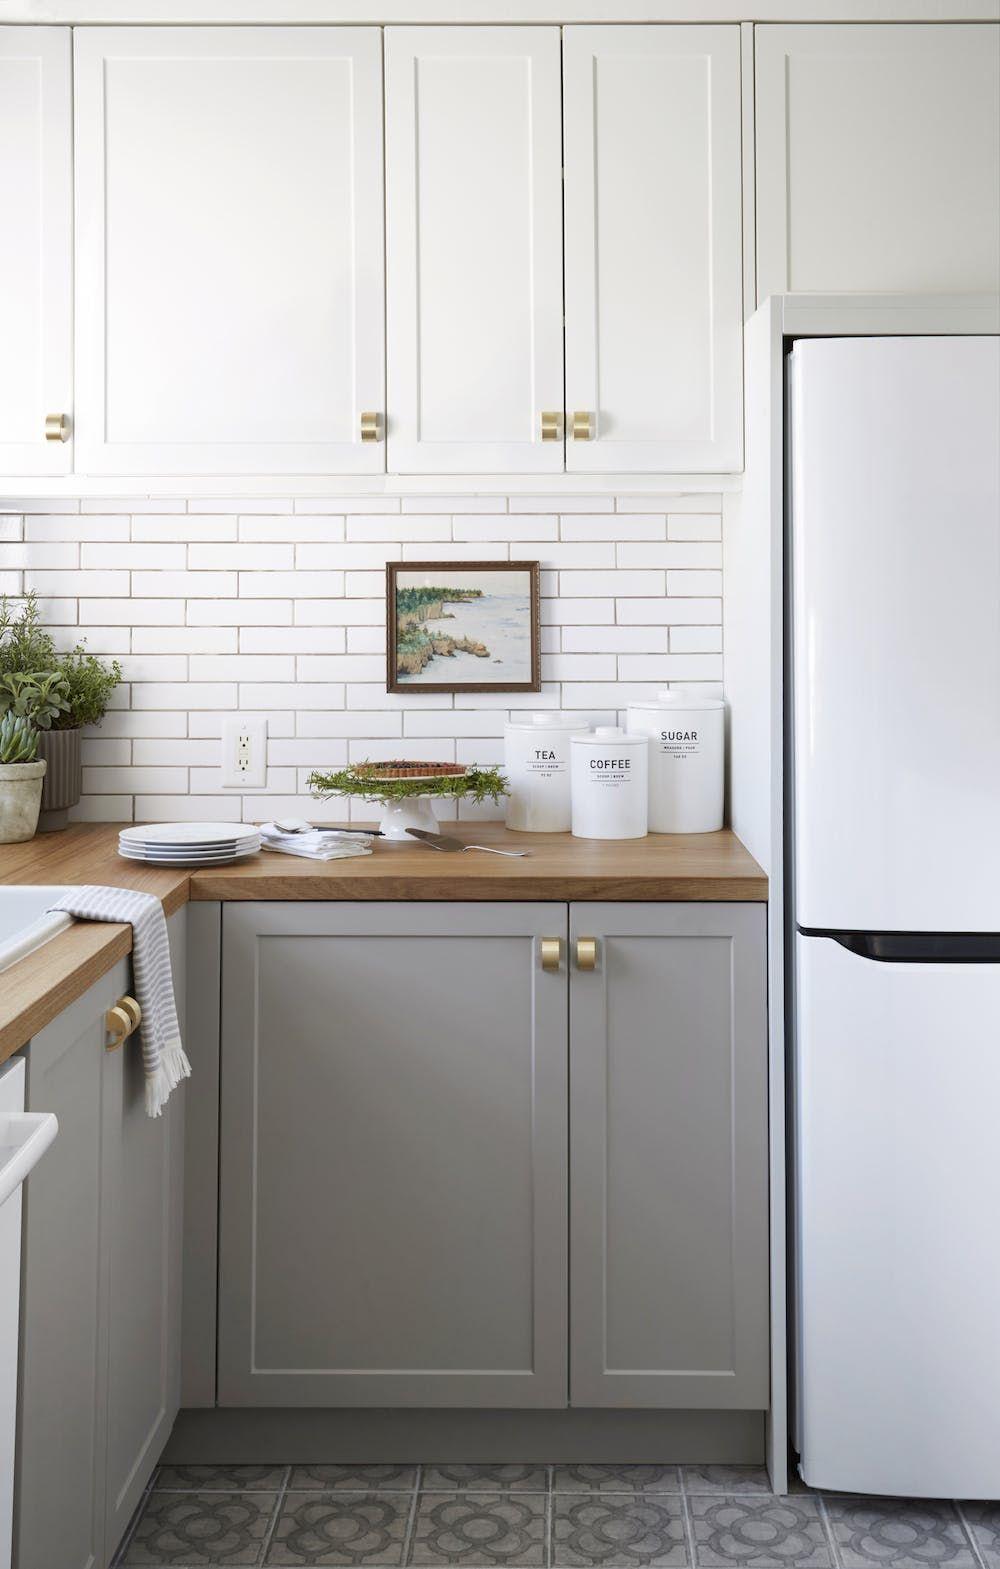 kitchen rental kids toys upgrades 10 reversible tweaks for every level of diy daring